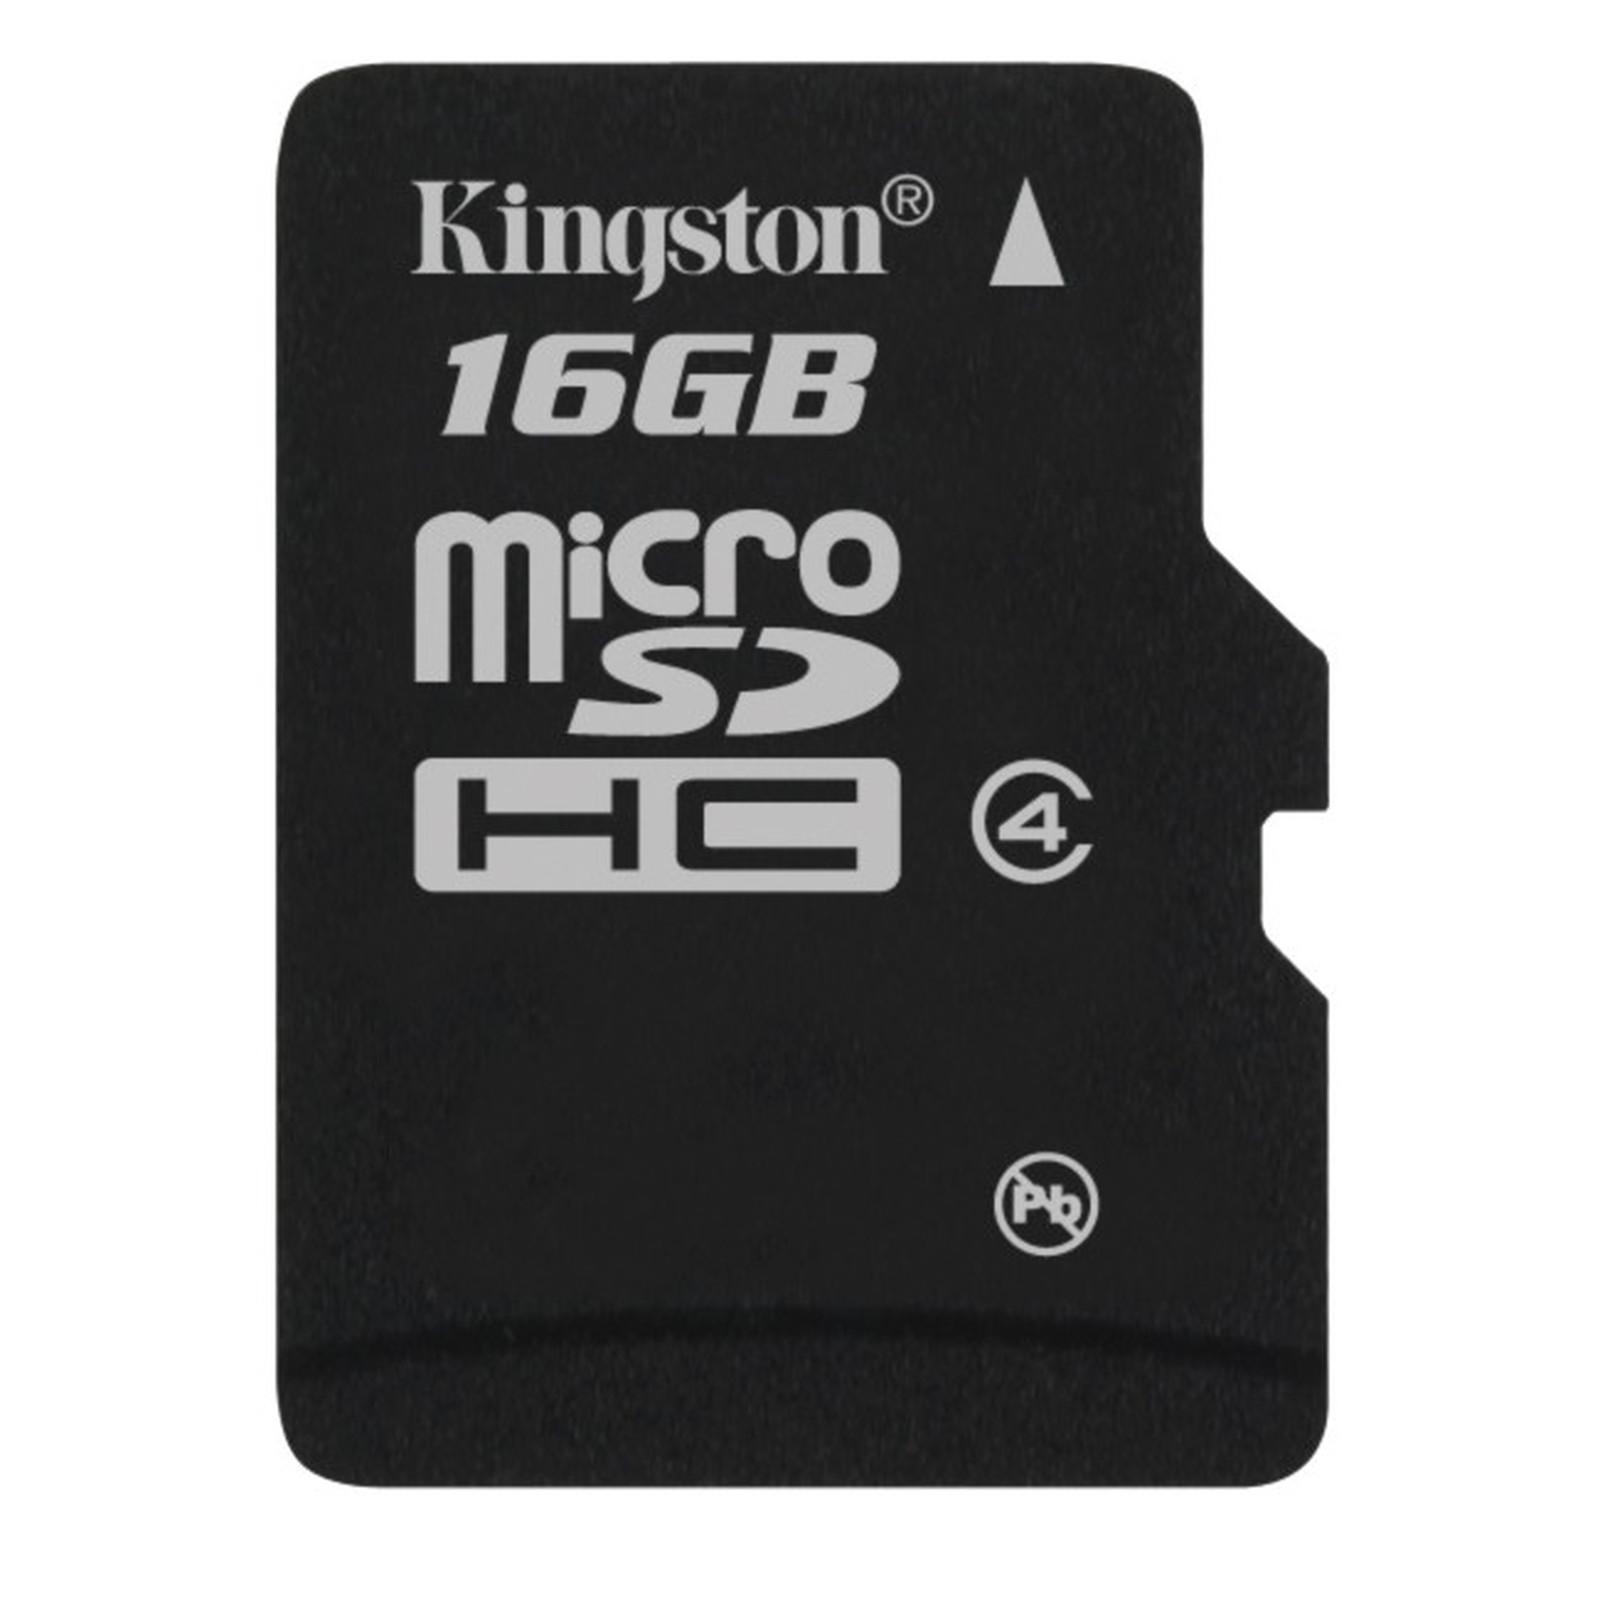 Kingston microSDHC 16 GB Class 4